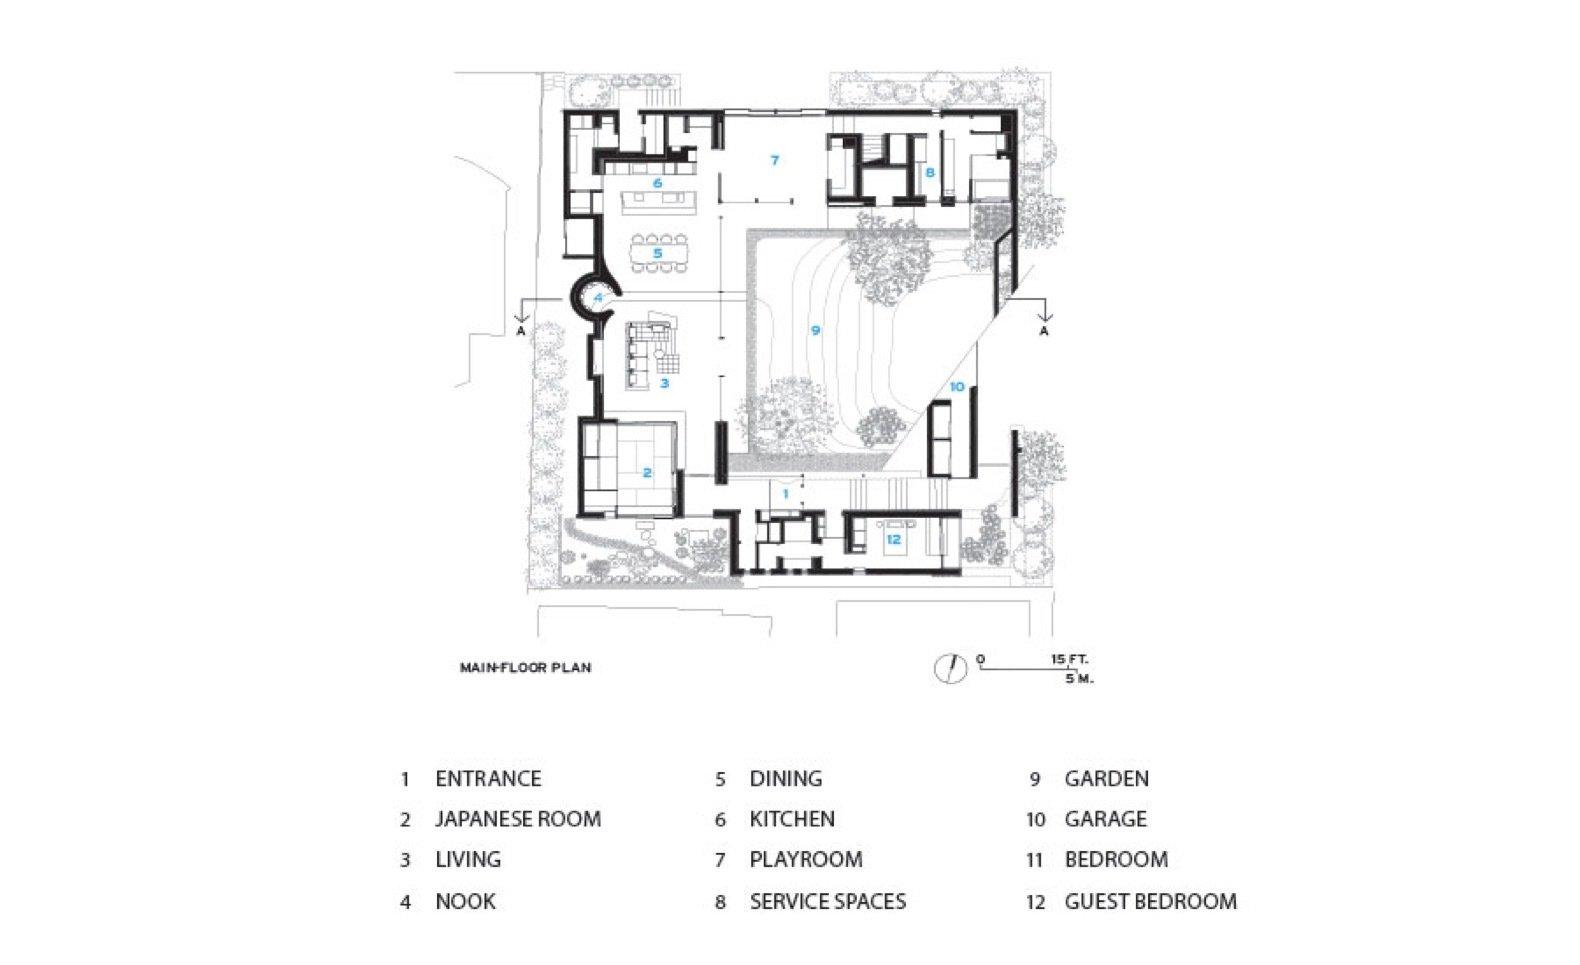 Garden Lath House Plans on hvac house plans, hampton house plans, garden house plans,